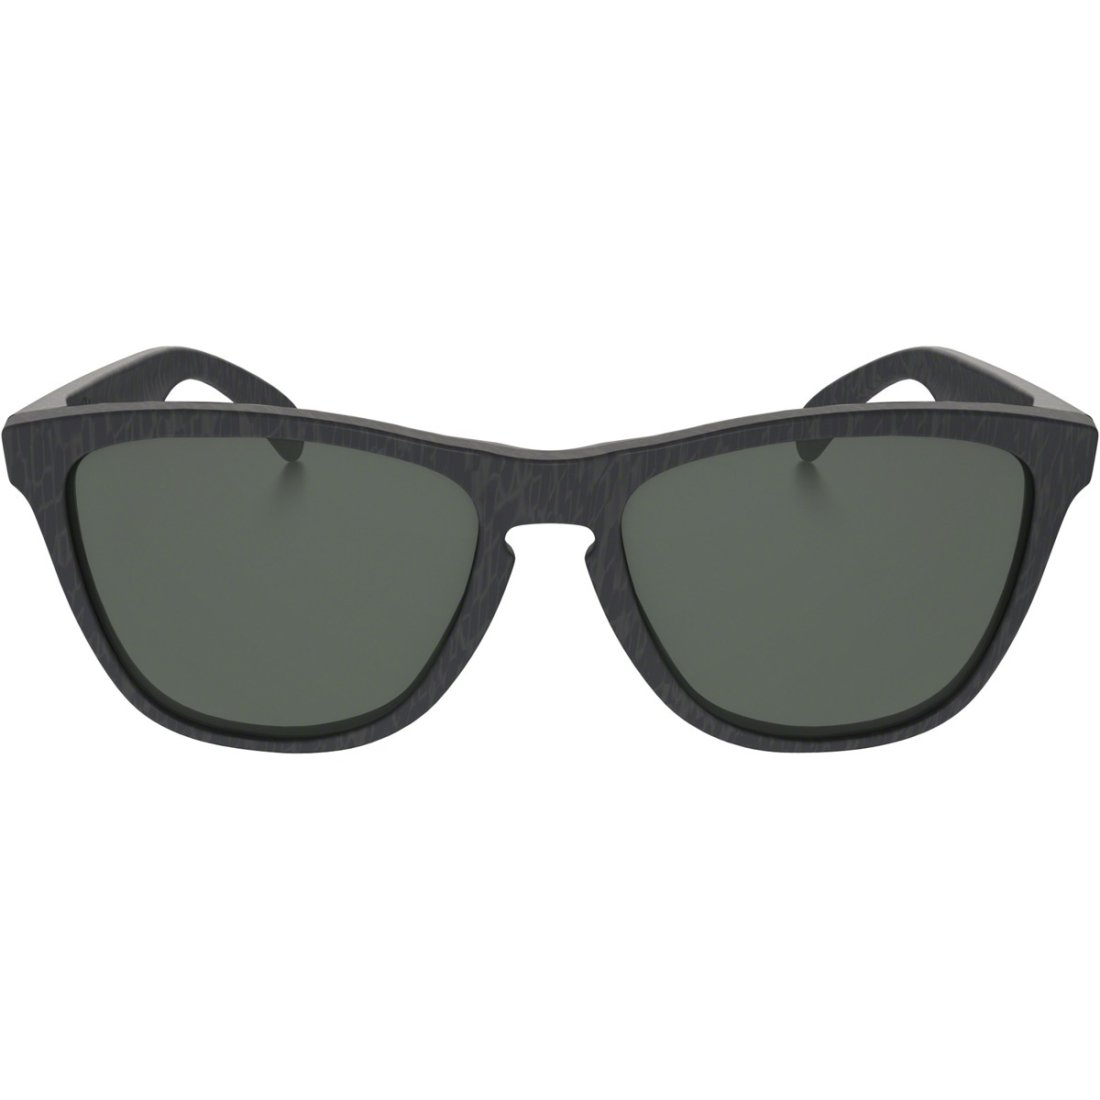 192de54d5c OAKLEY Frogskins High Grade Collection Gunpowder   Dark Grey Sun glasses